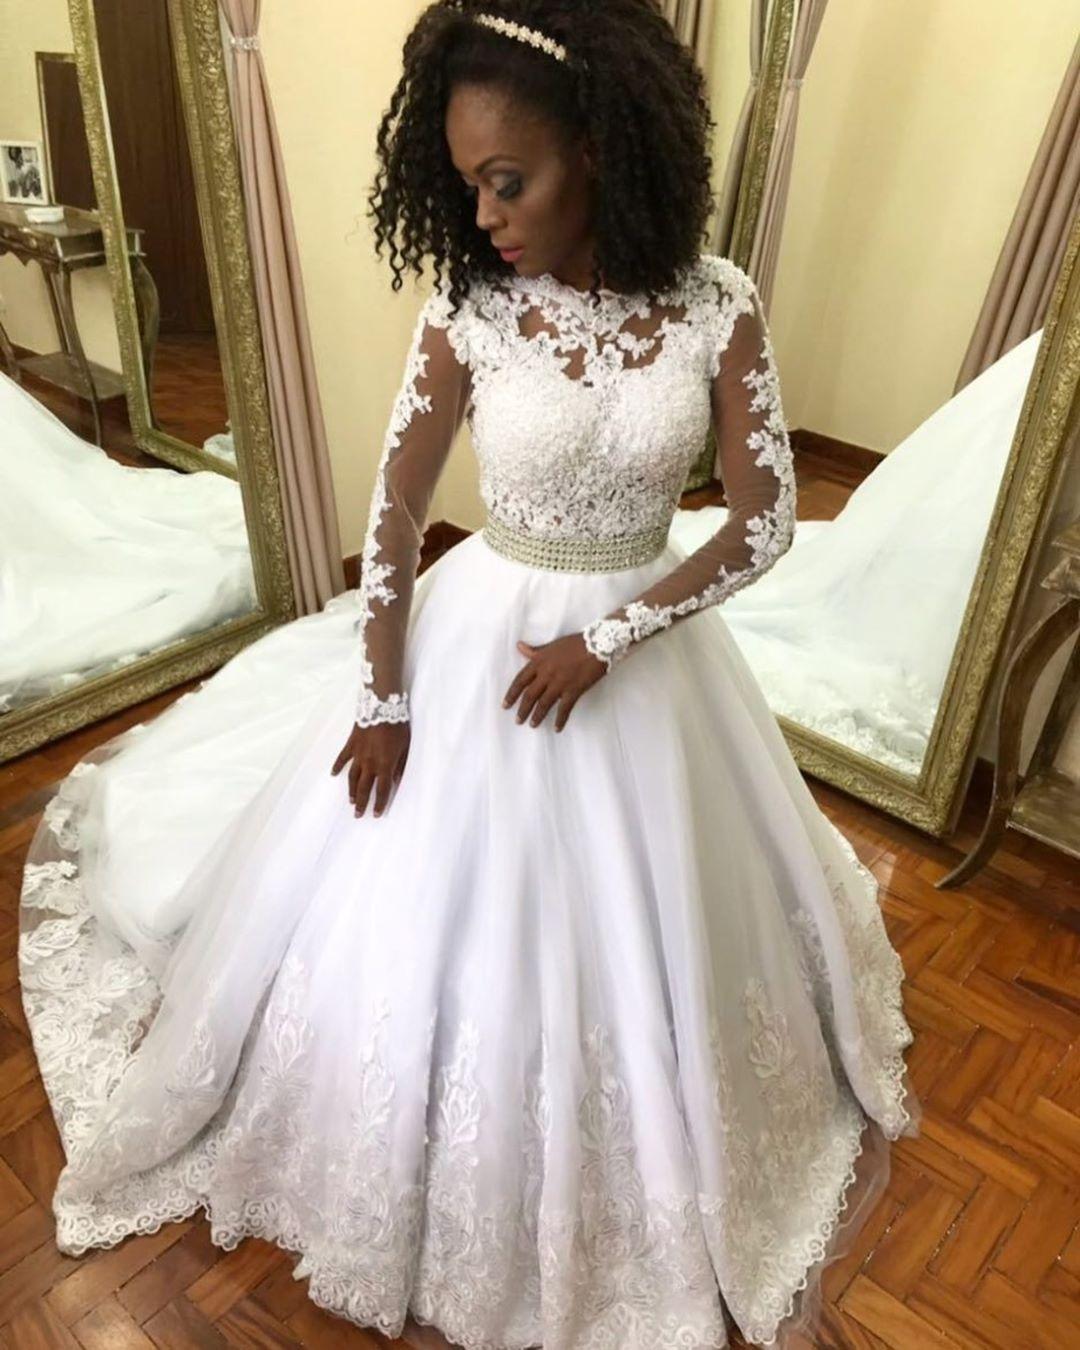 Vintage Wedding Dresses For Sale South Africa: Glamorous Lace Wedding Dress Modest Vintage Long Sleeves